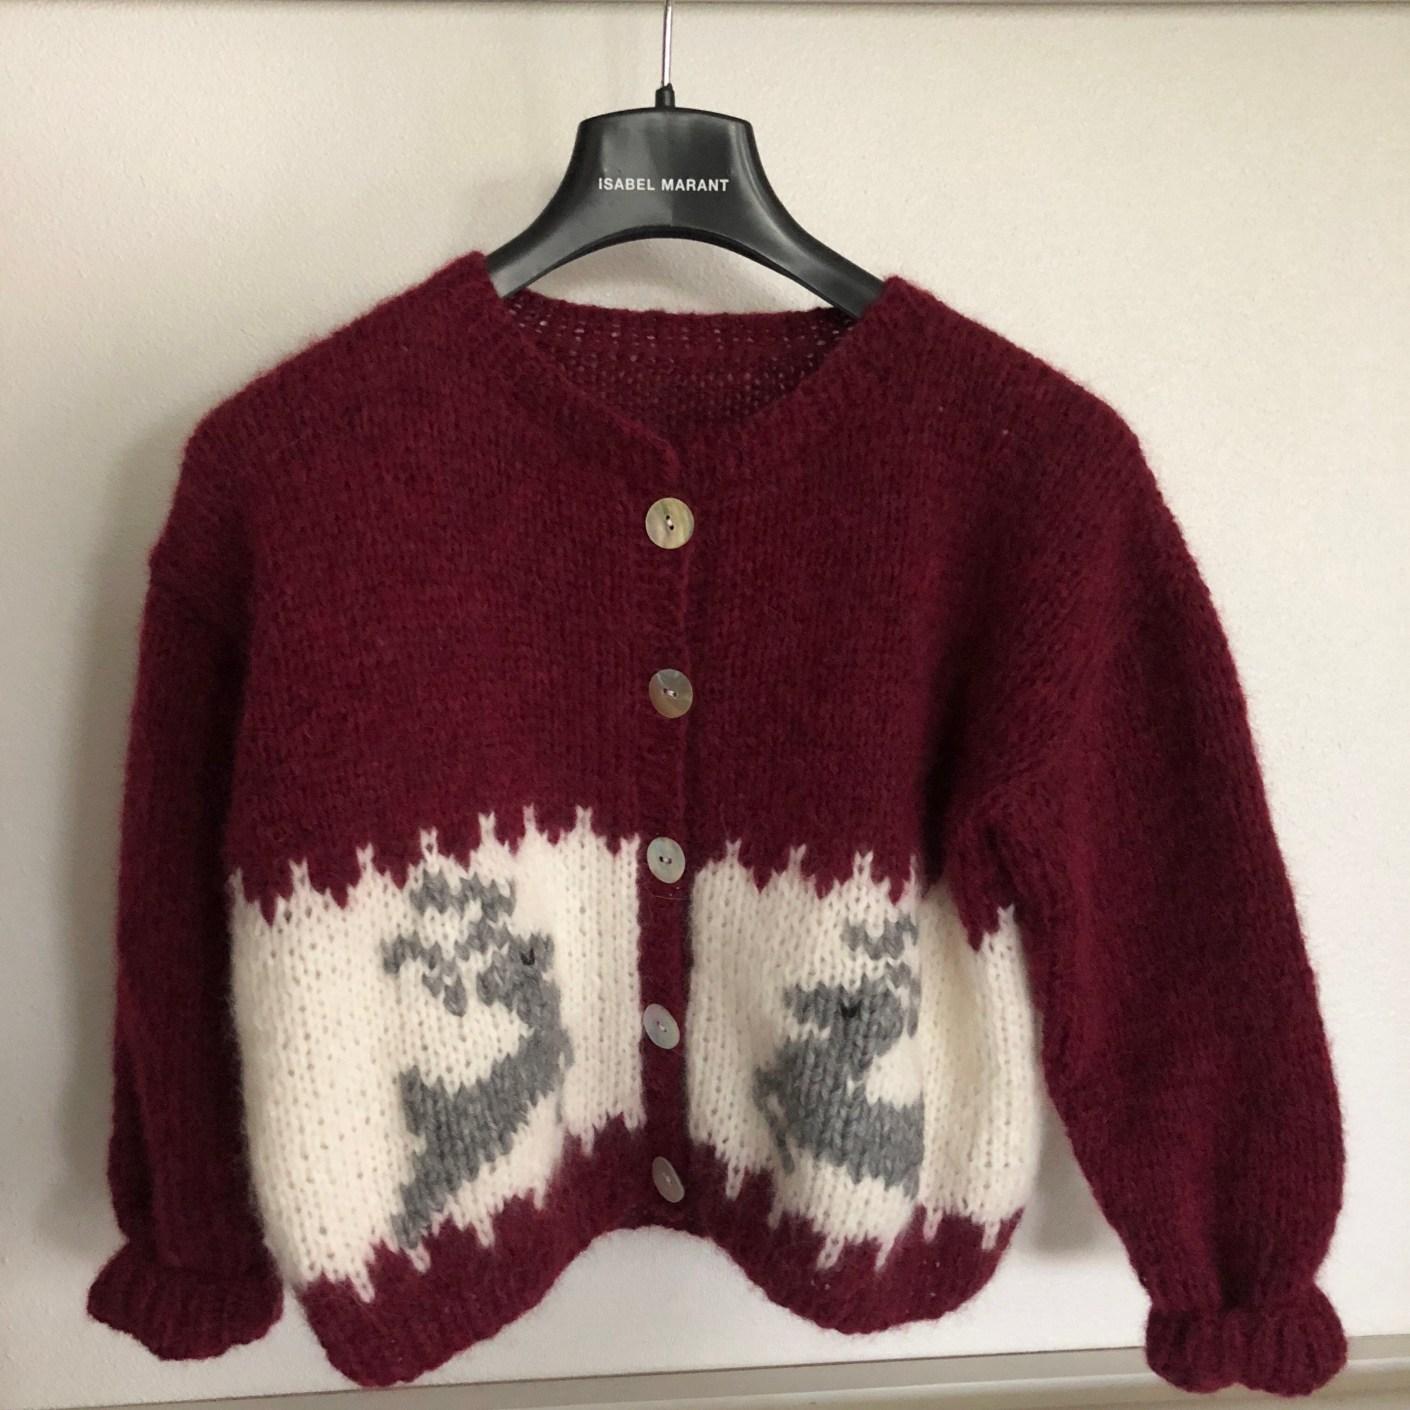 Julesweater til børn